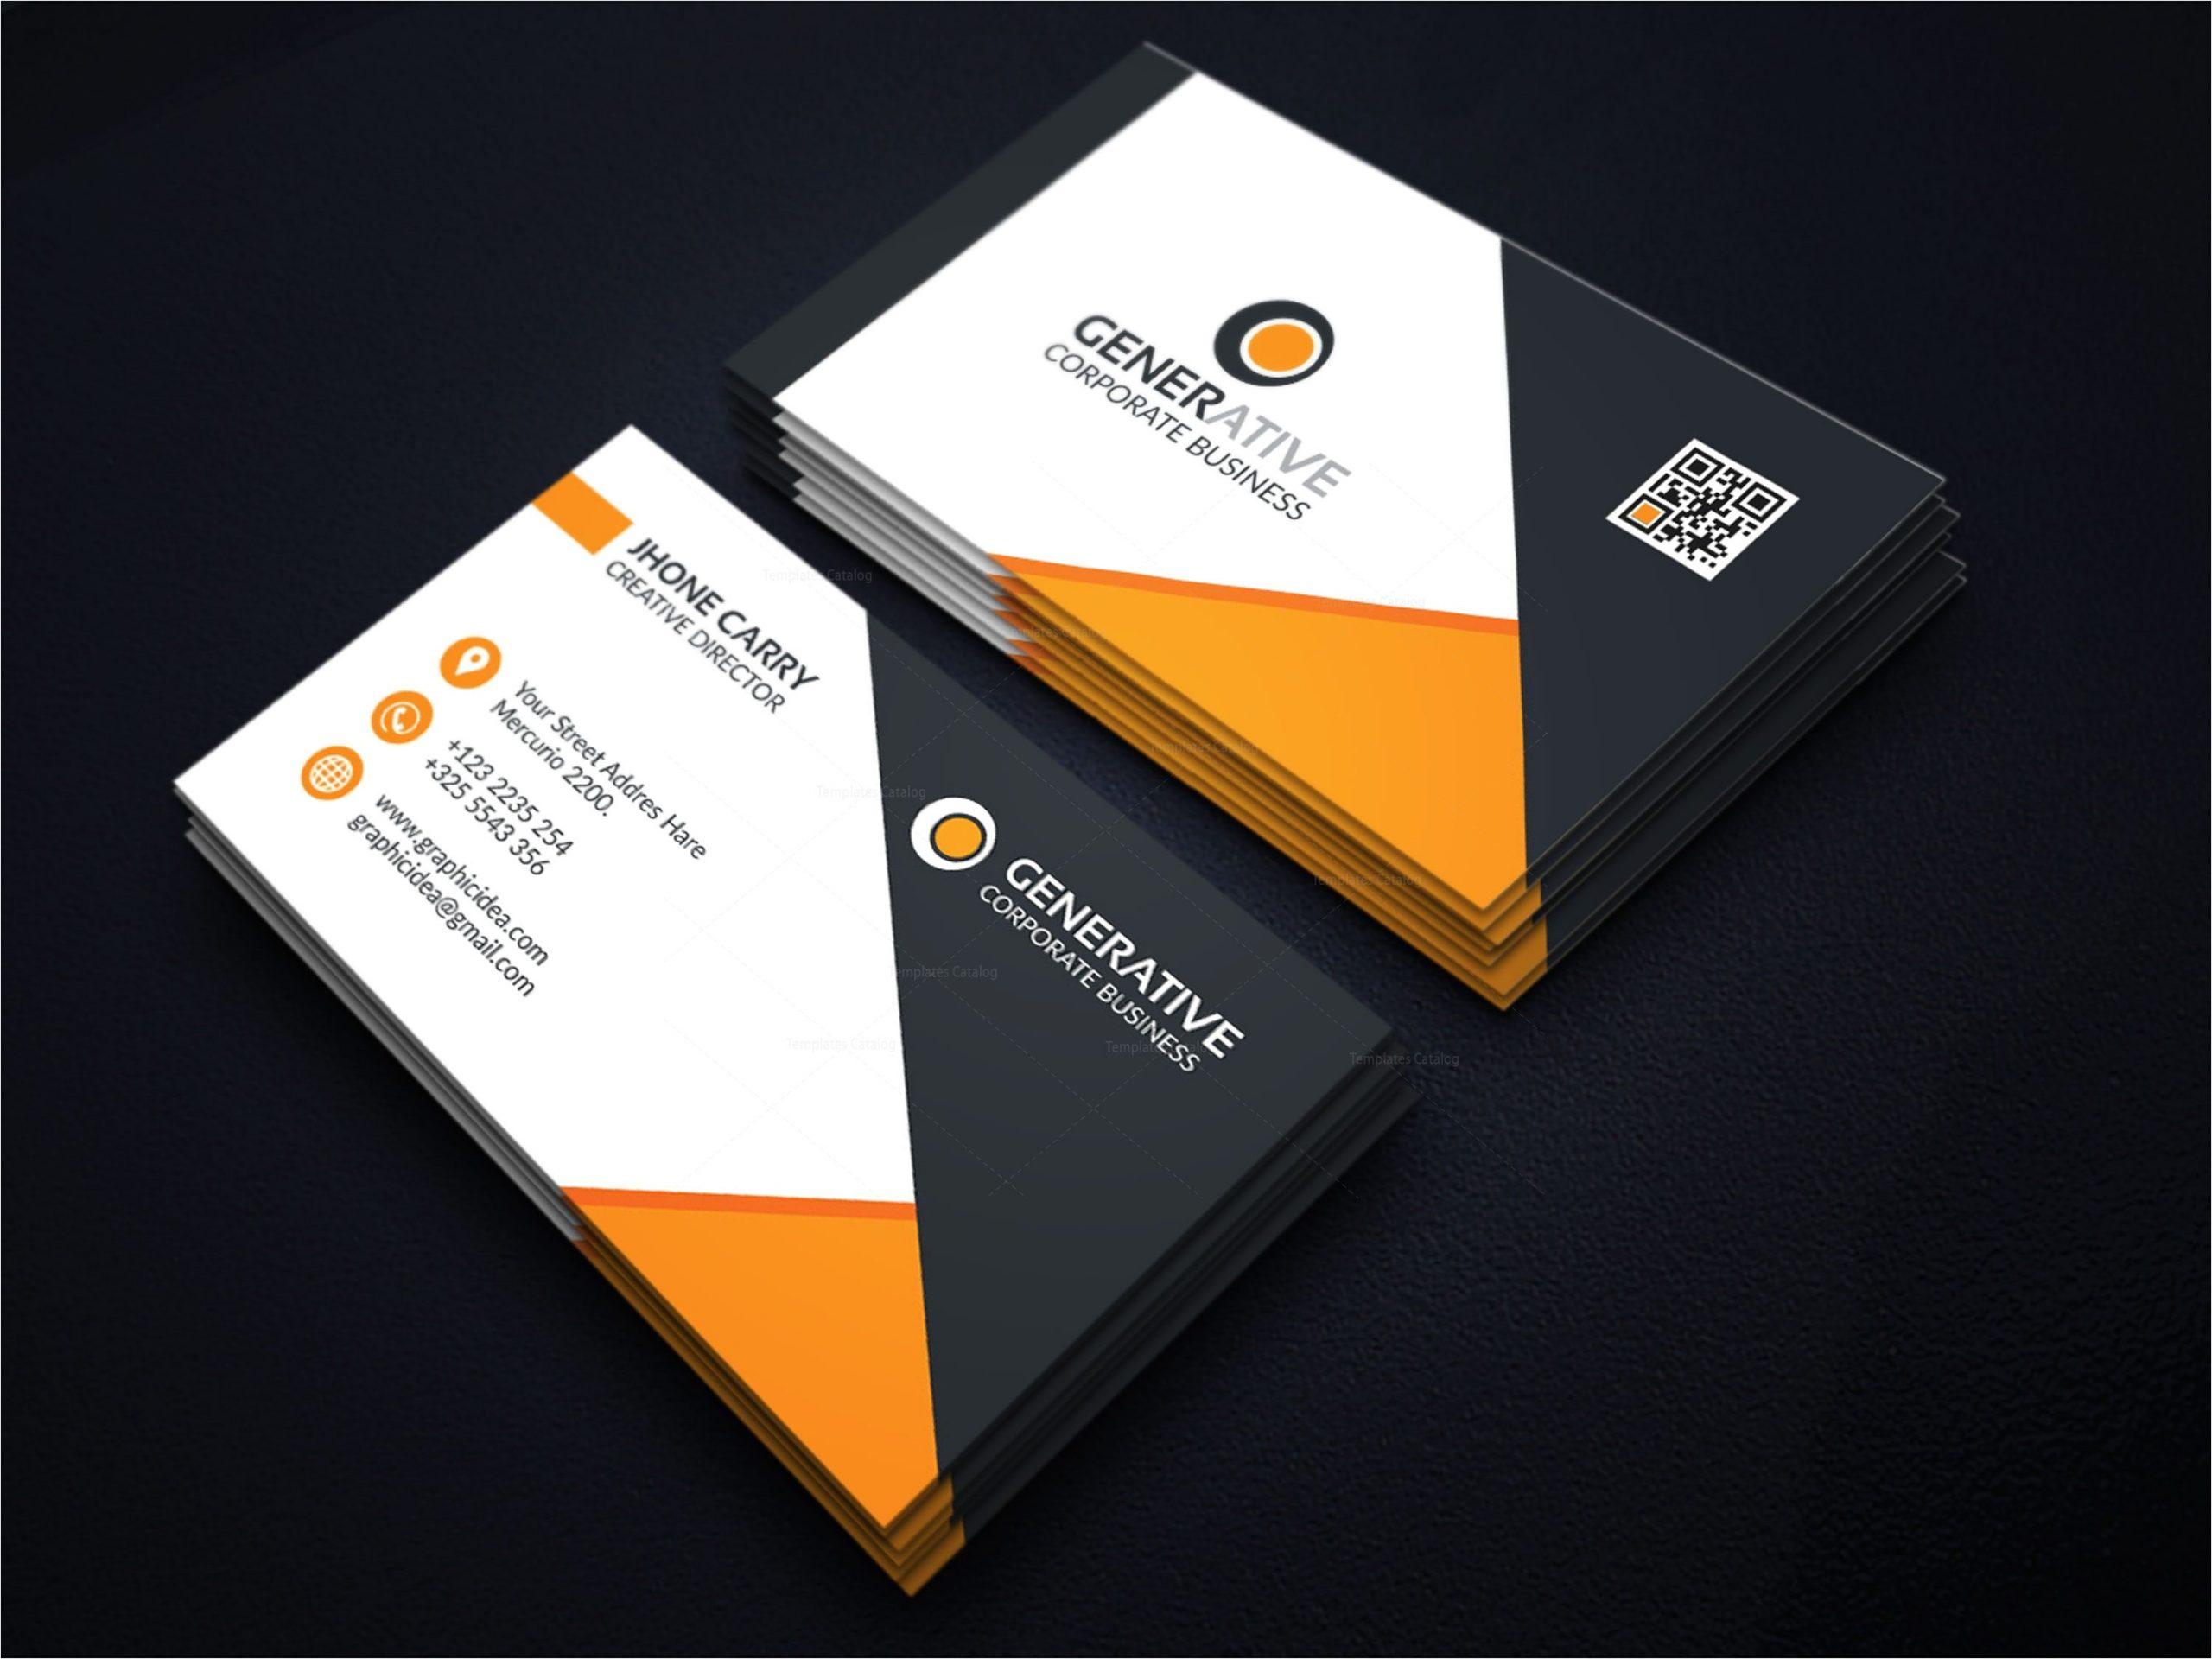 eps creative business card design template